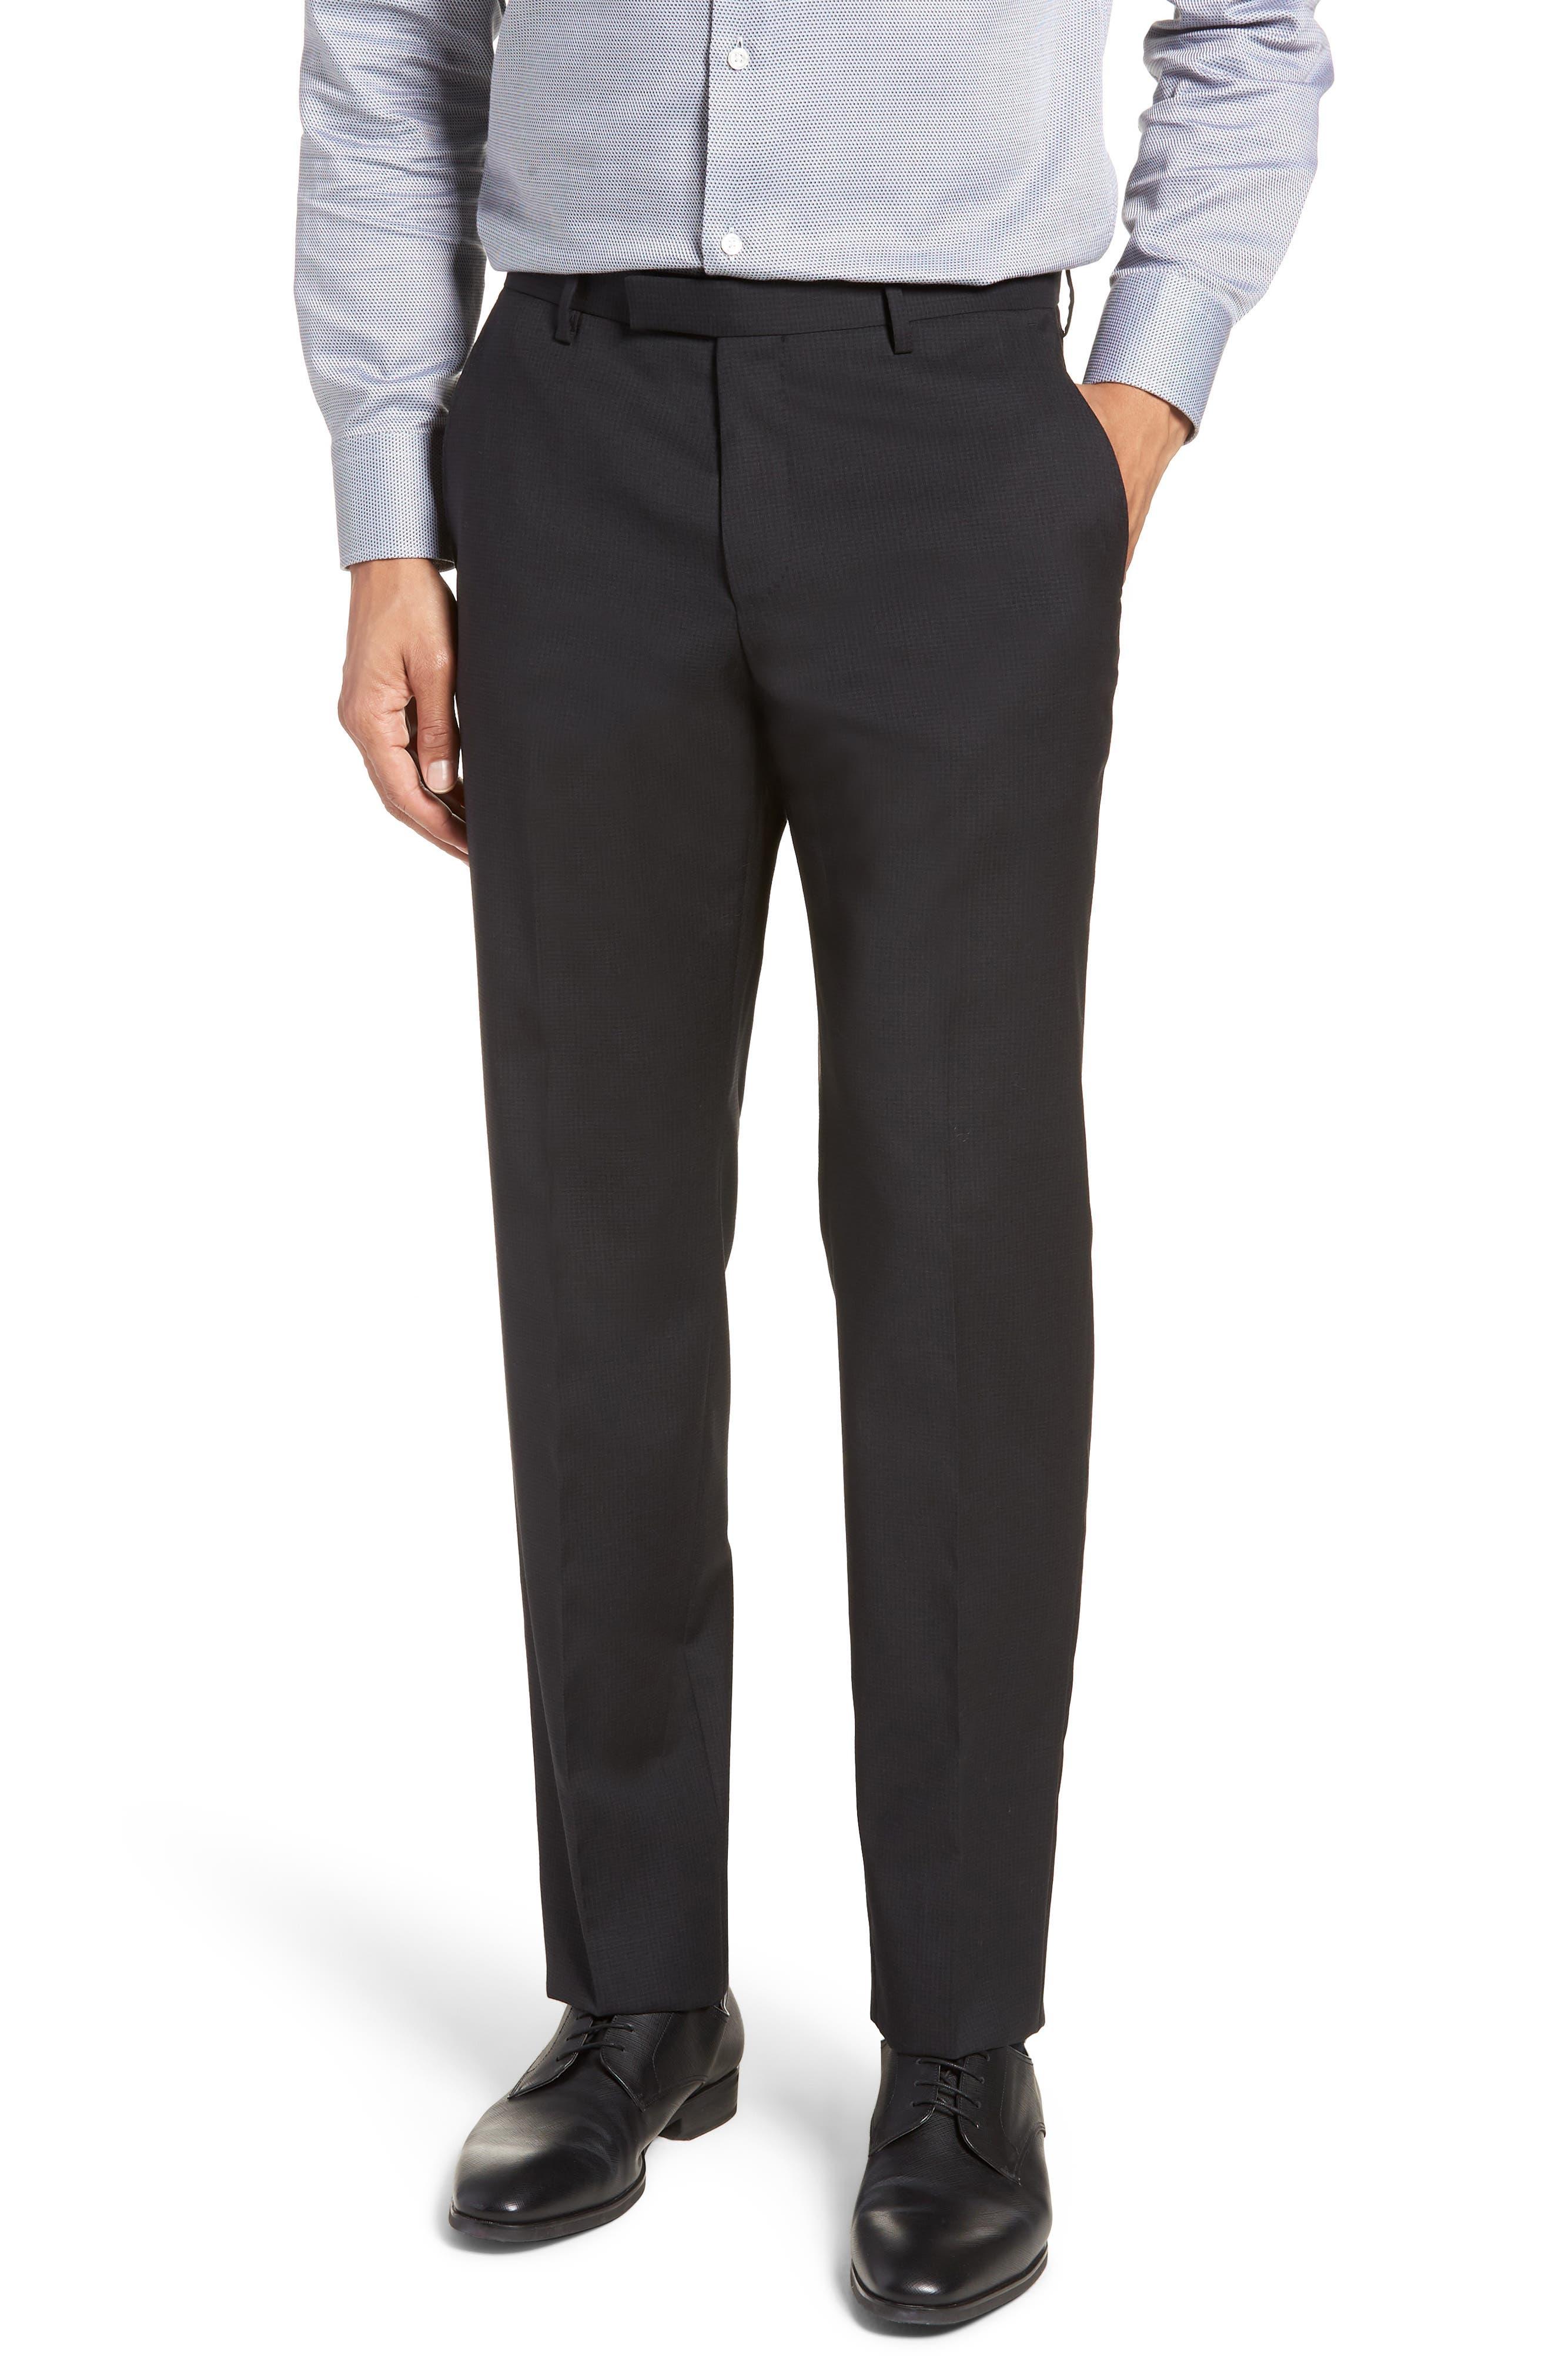 Leenon Flat Front Check Wool Trousers,                             Main thumbnail 1, color,                             BLACK